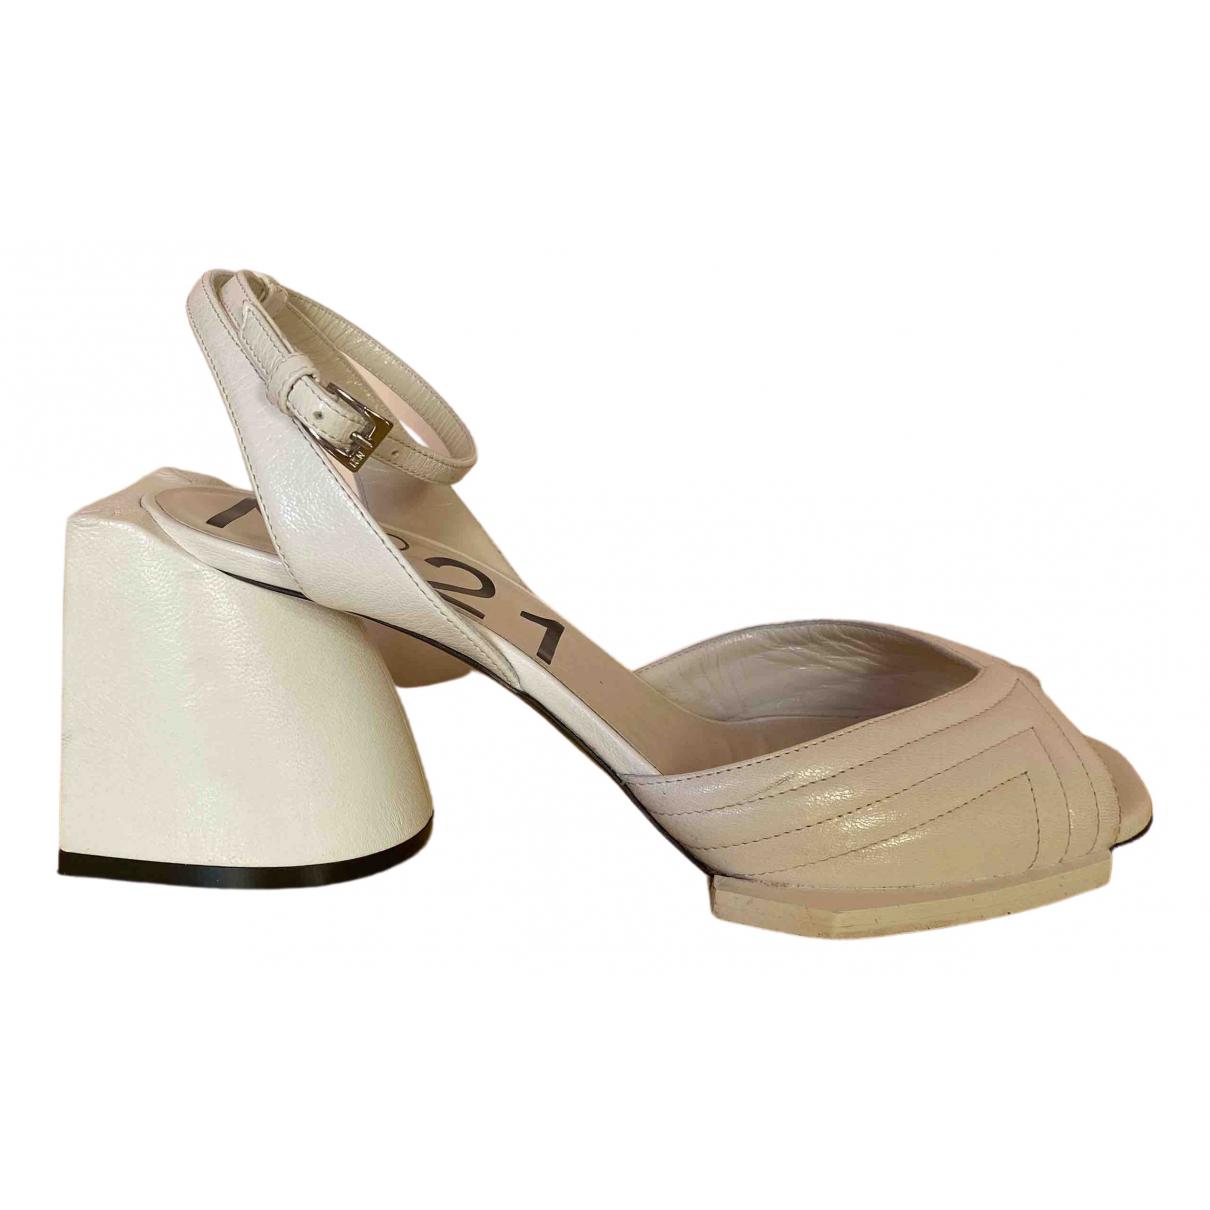 N°21 \N White Leather Sandals for Women 37 EU